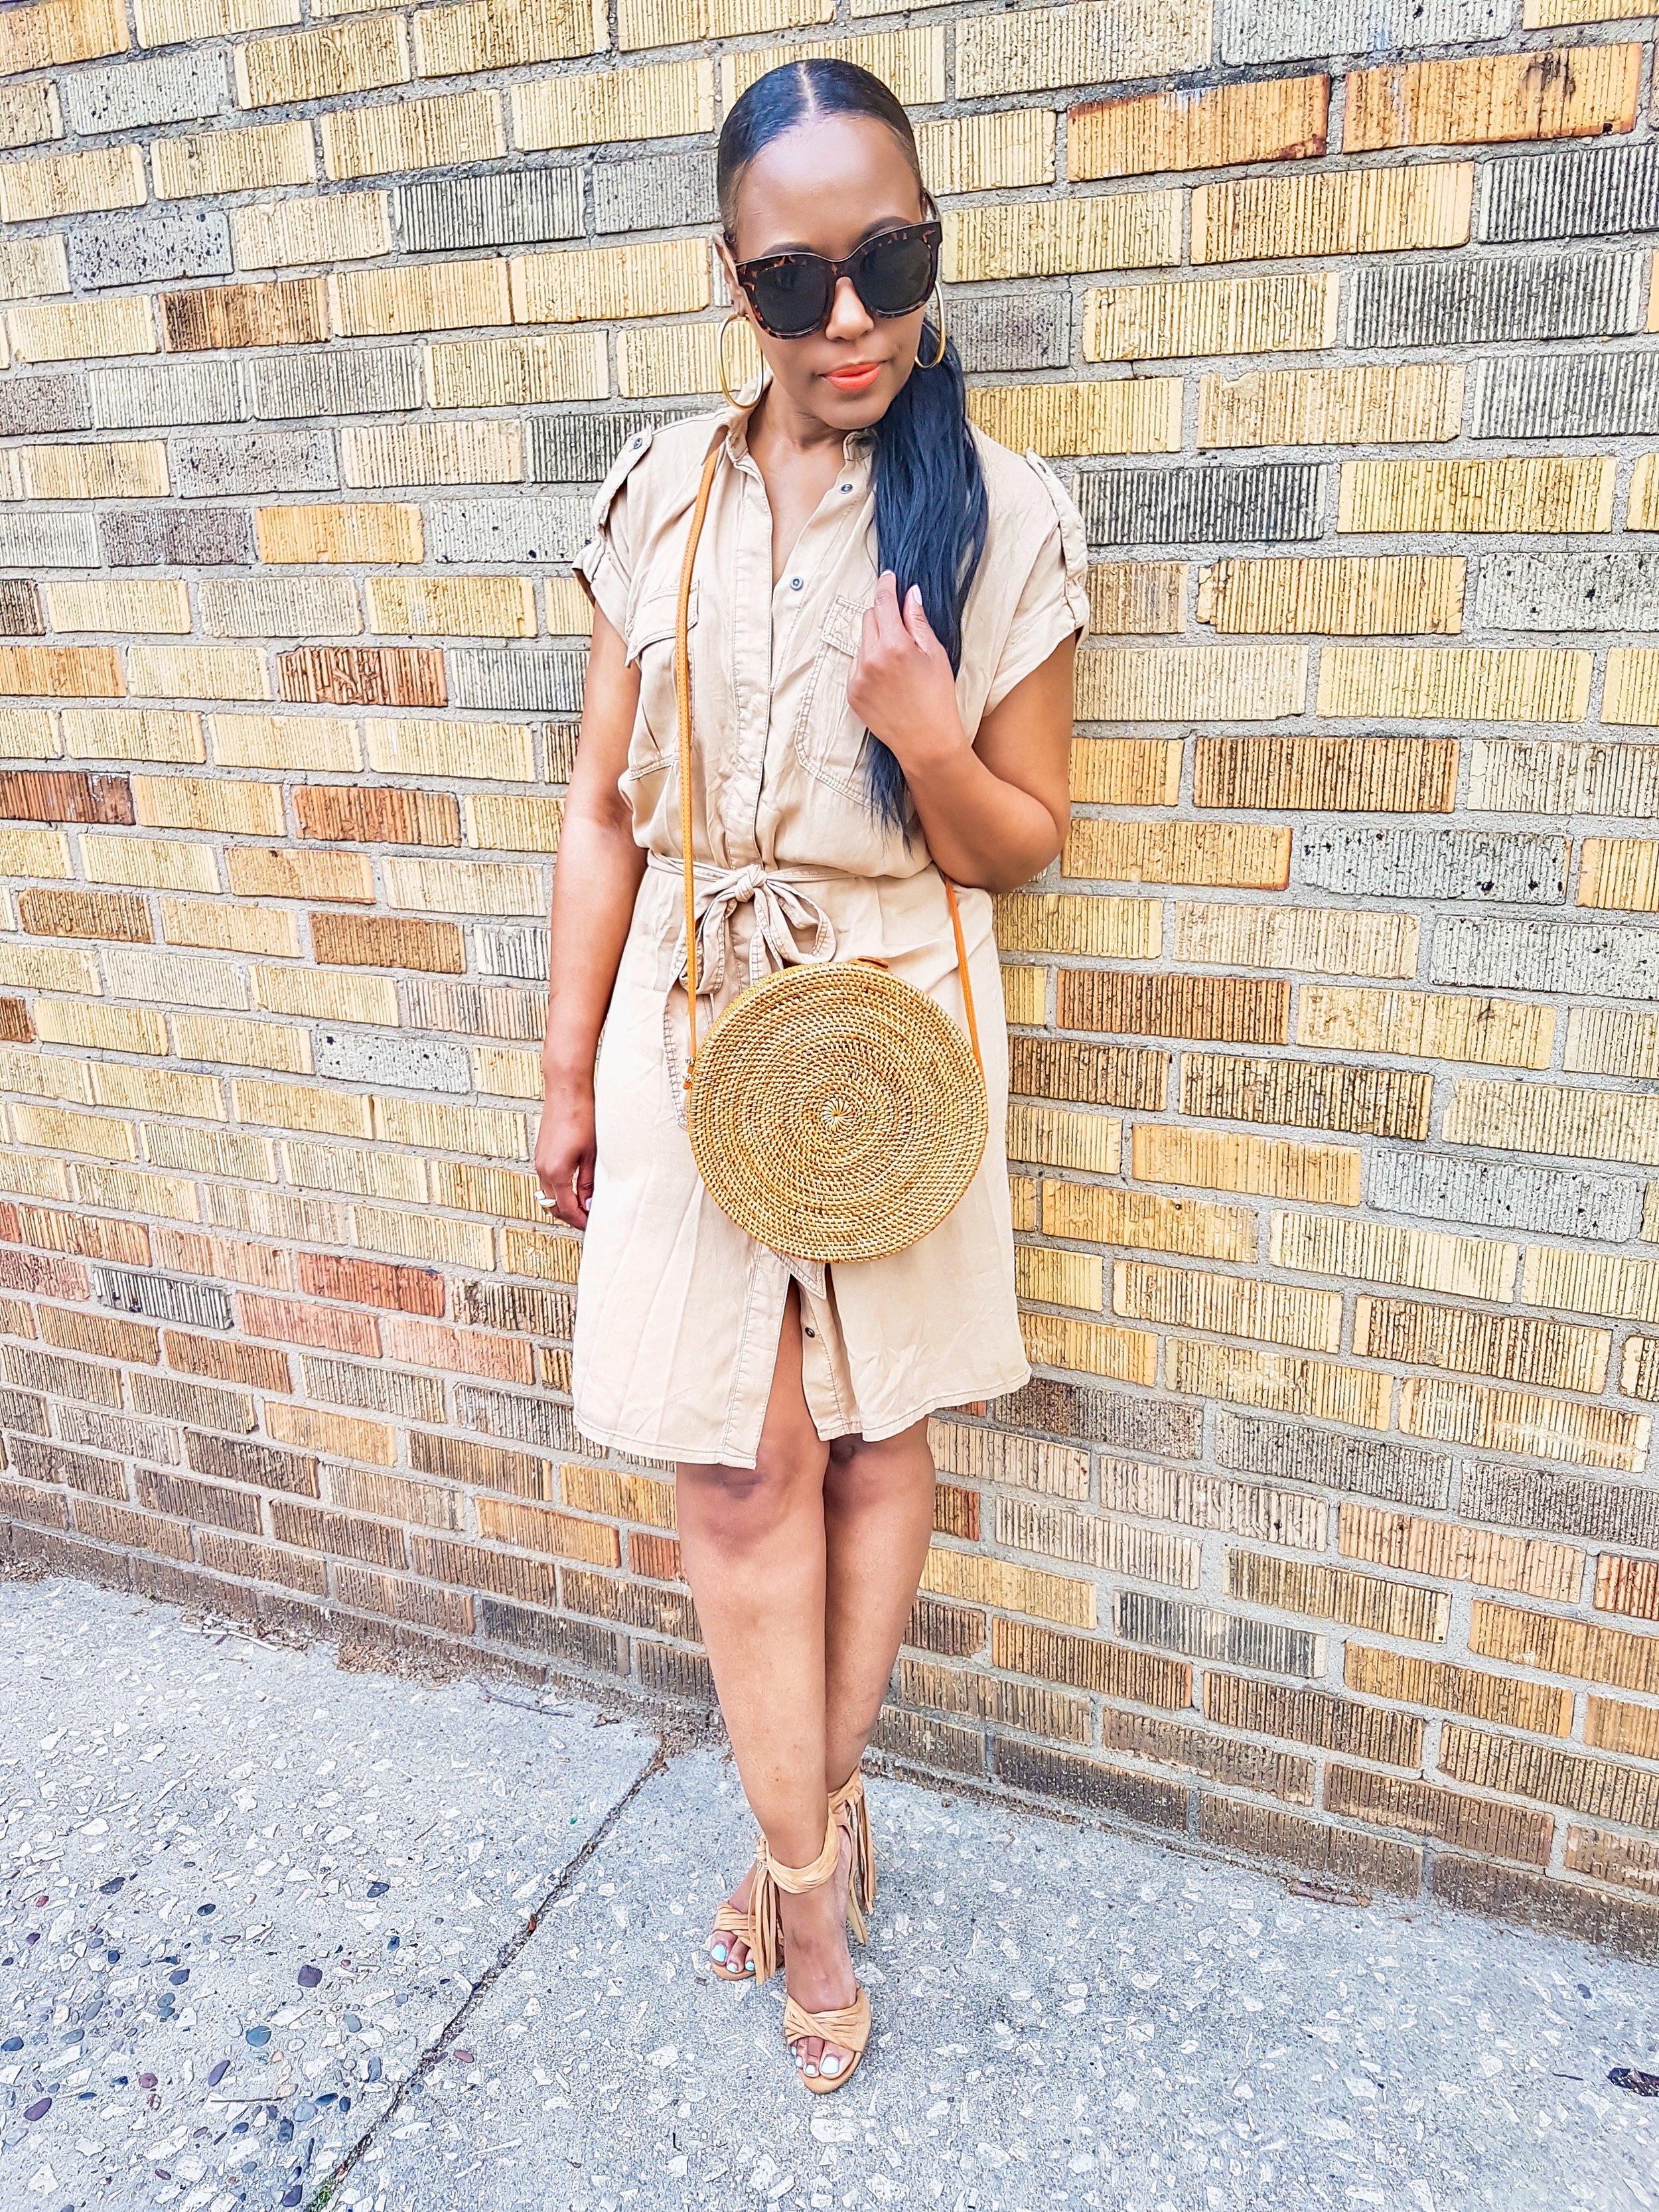 Dress: H&M(thrifted) Bag: Amerii